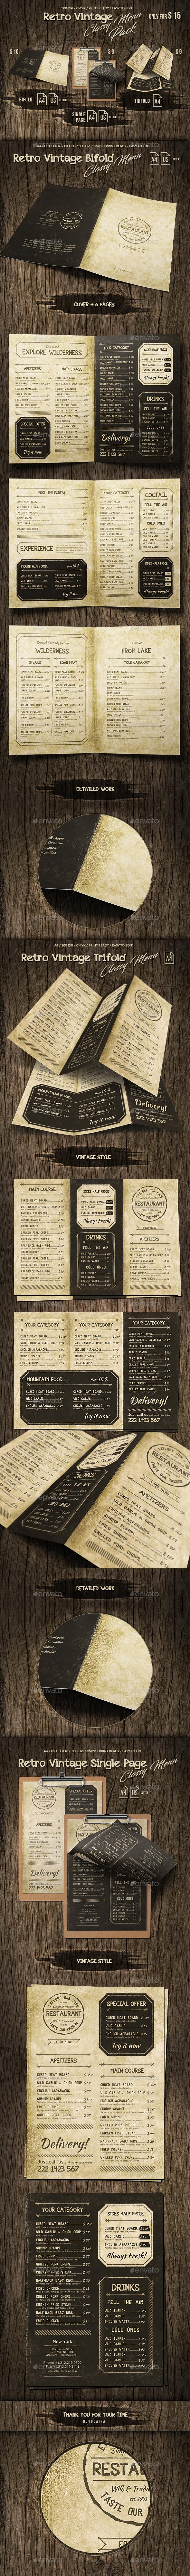 Retro Vintage Classy Menu Bundle - Food Menus Print Templates